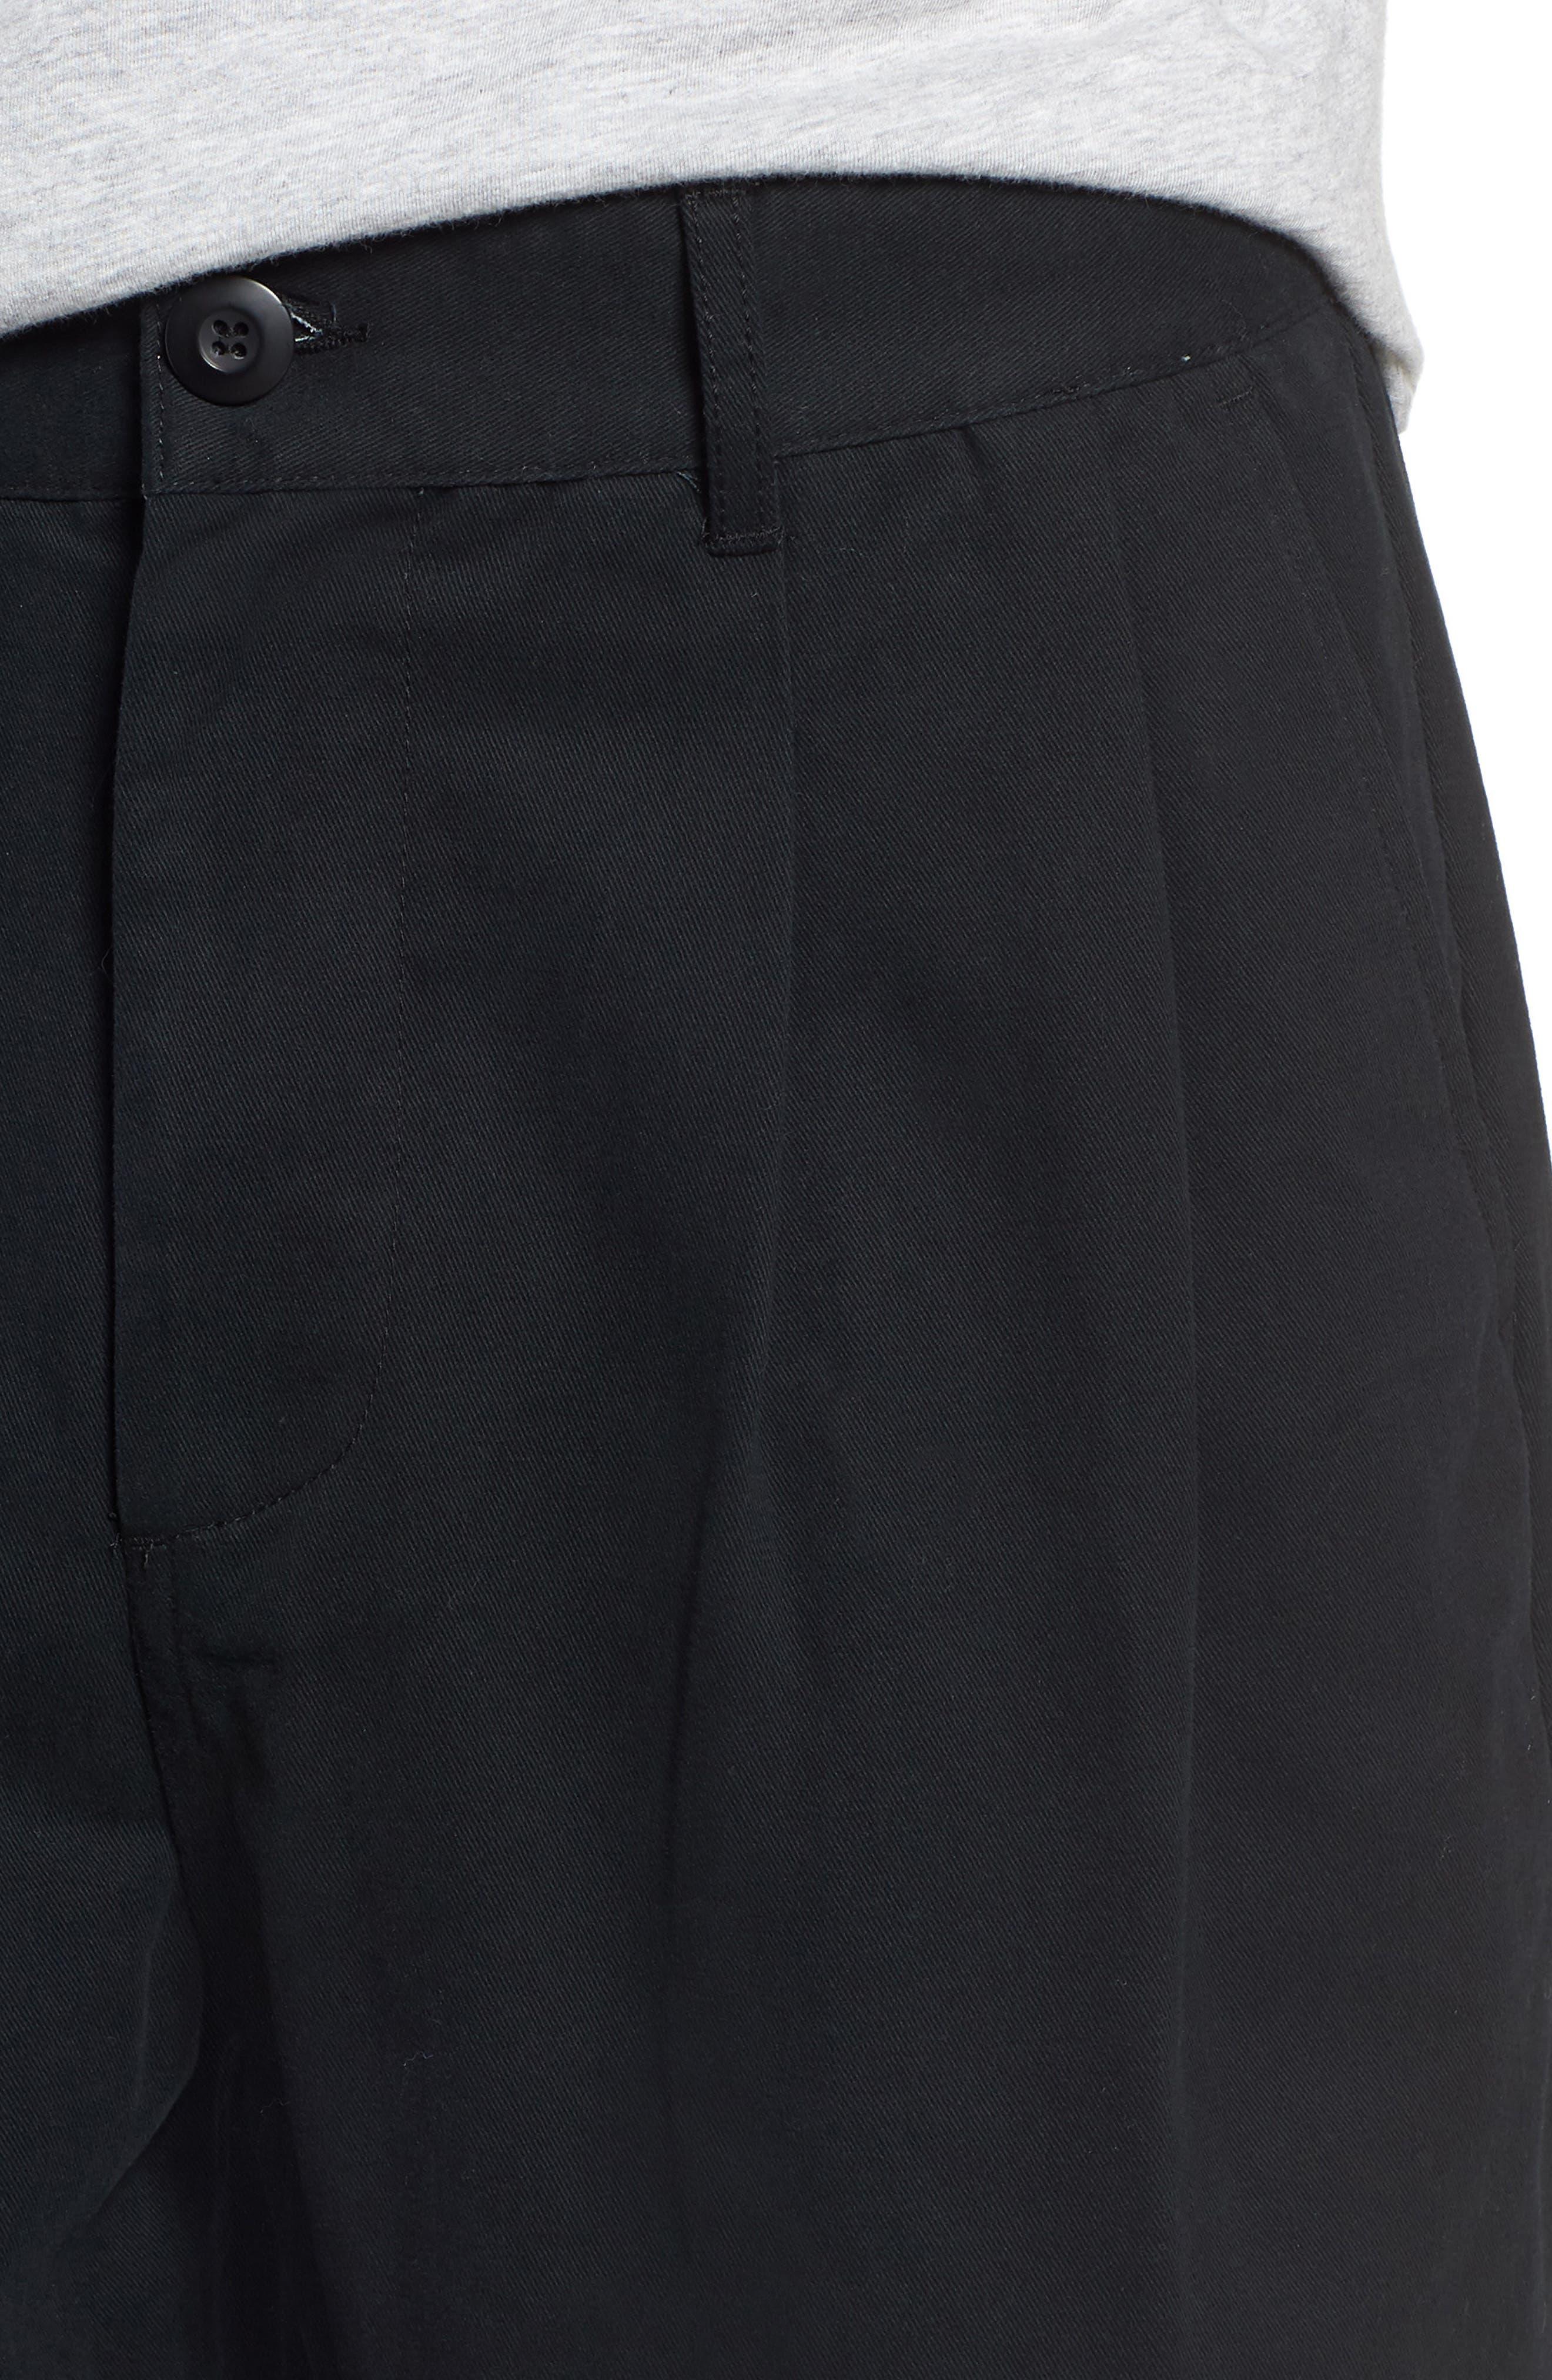 Fubar Pleated Relaxed Fit Pants,                             Alternate thumbnail 4, color,                             BLACK